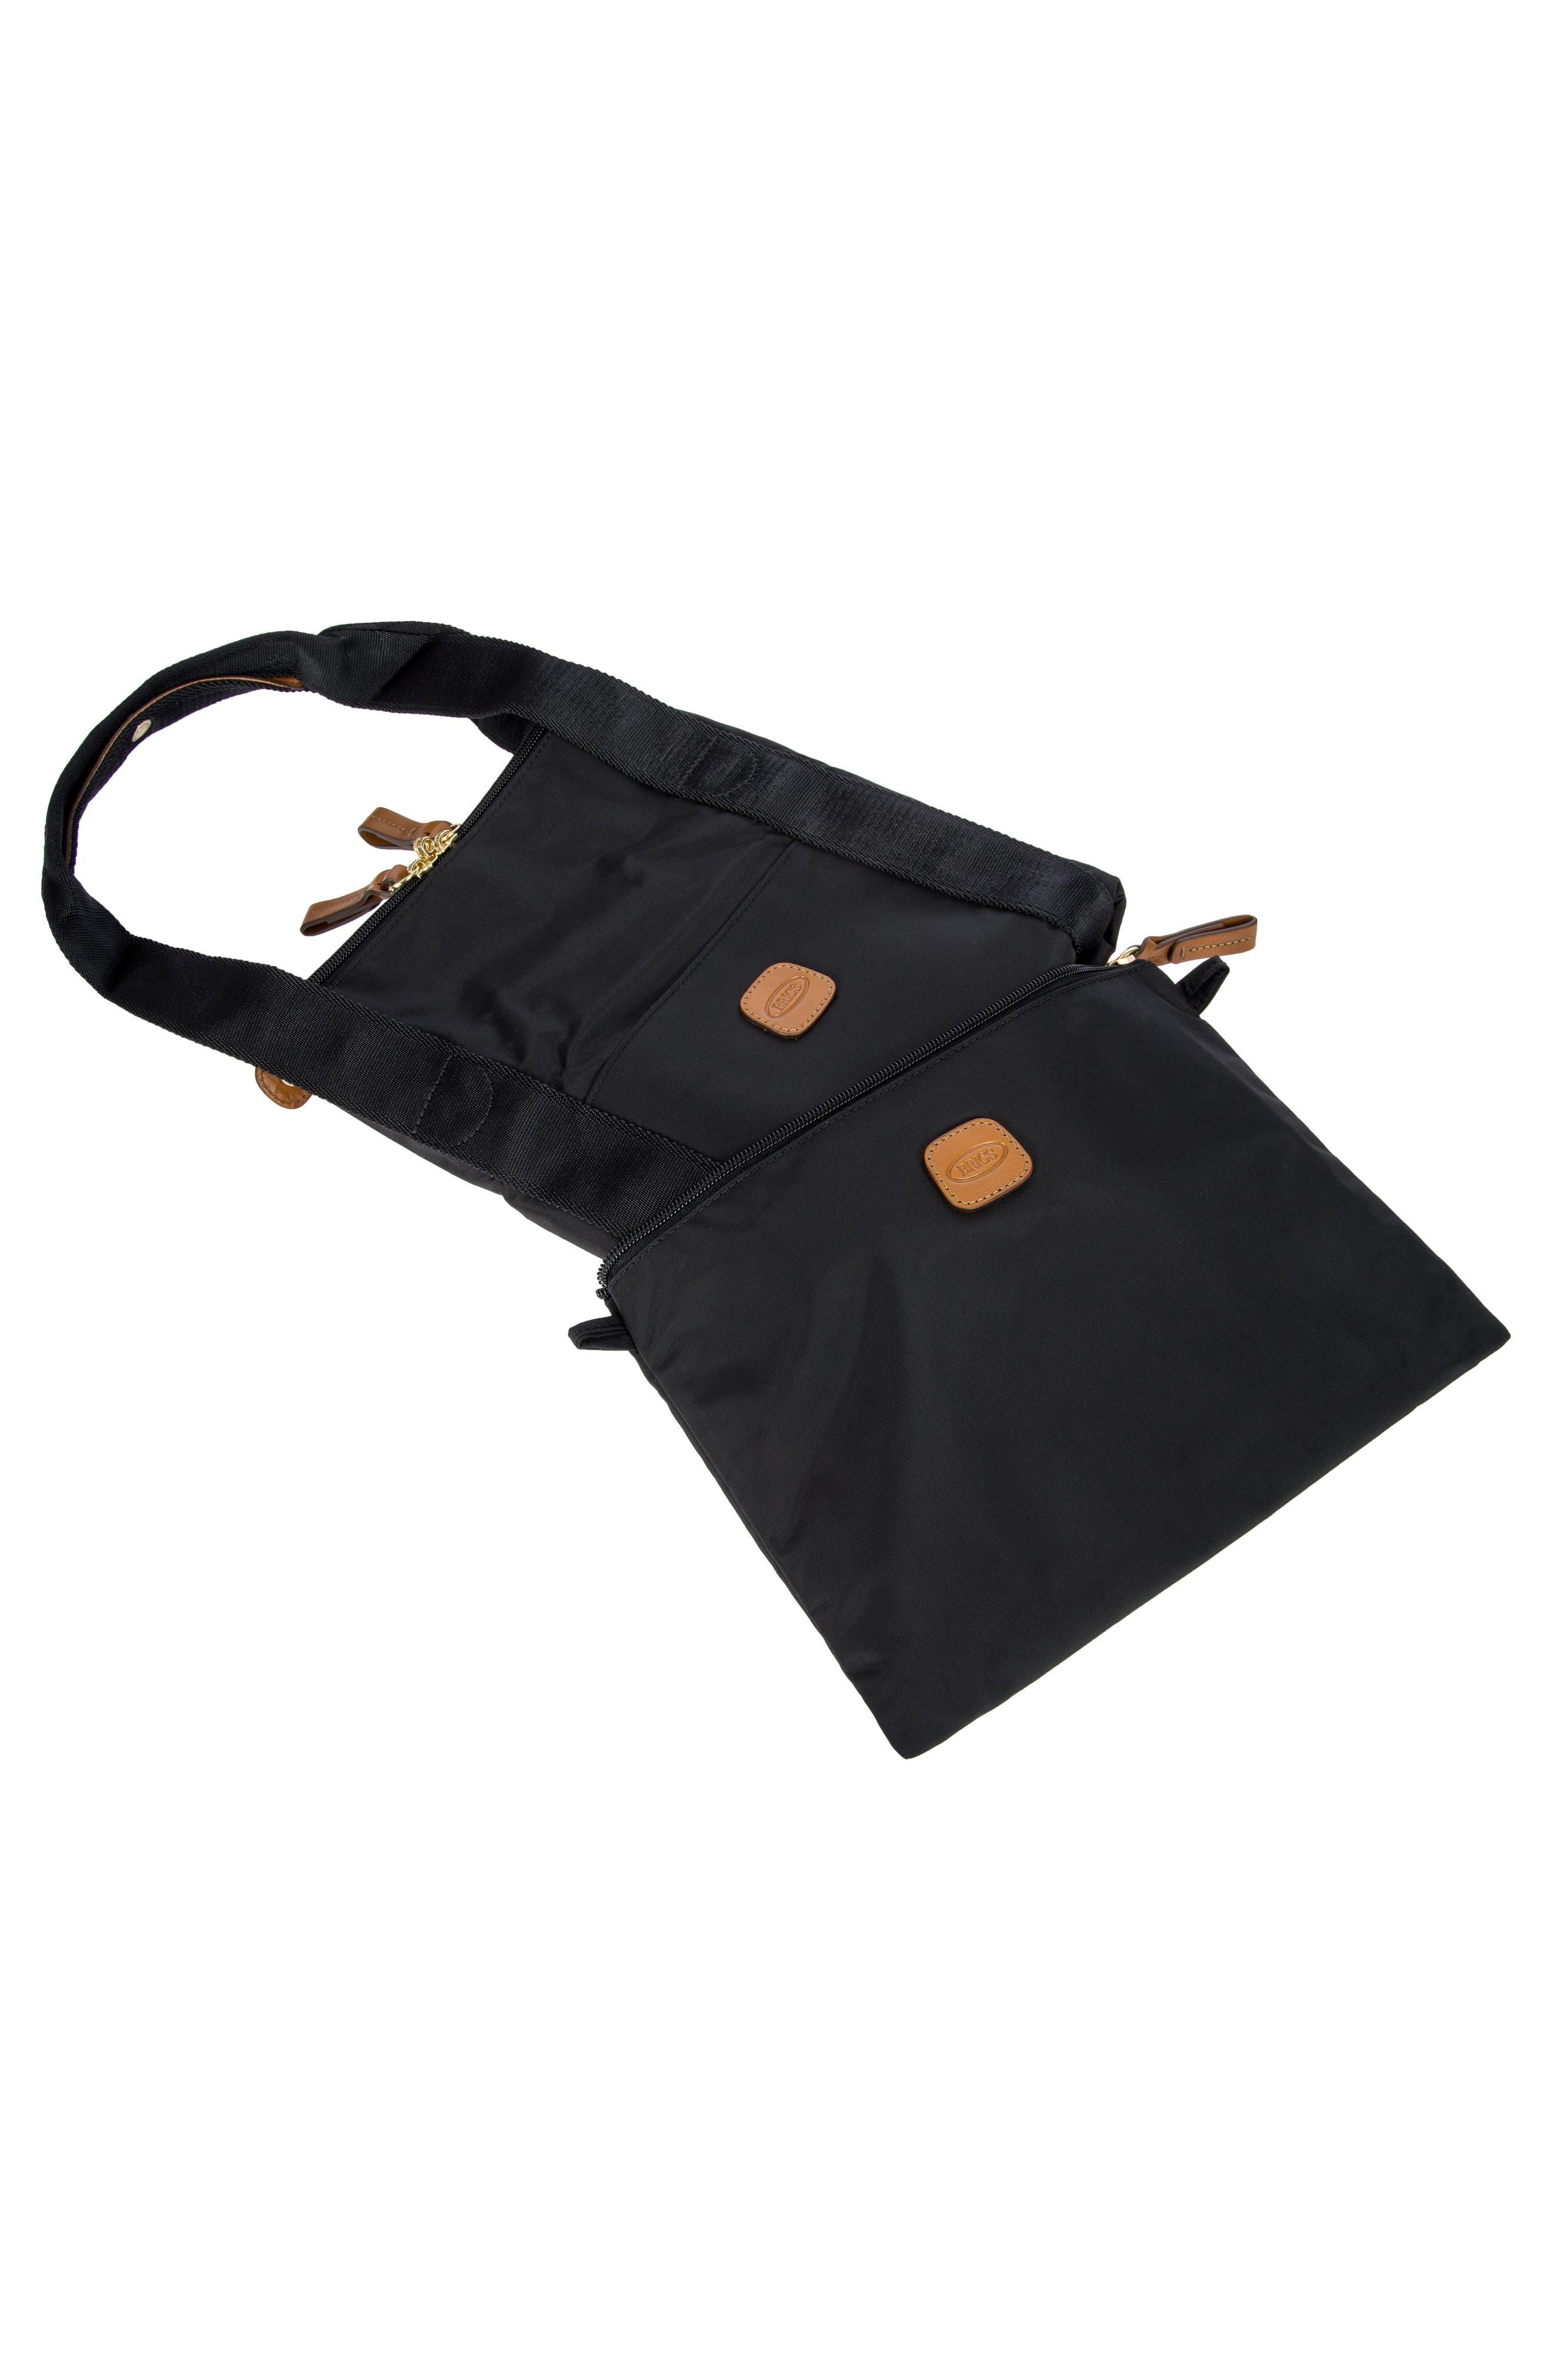 X-Bag 18-Inch Folding Duffel Bag,                             Alternate thumbnail 7, color,                             BLACK